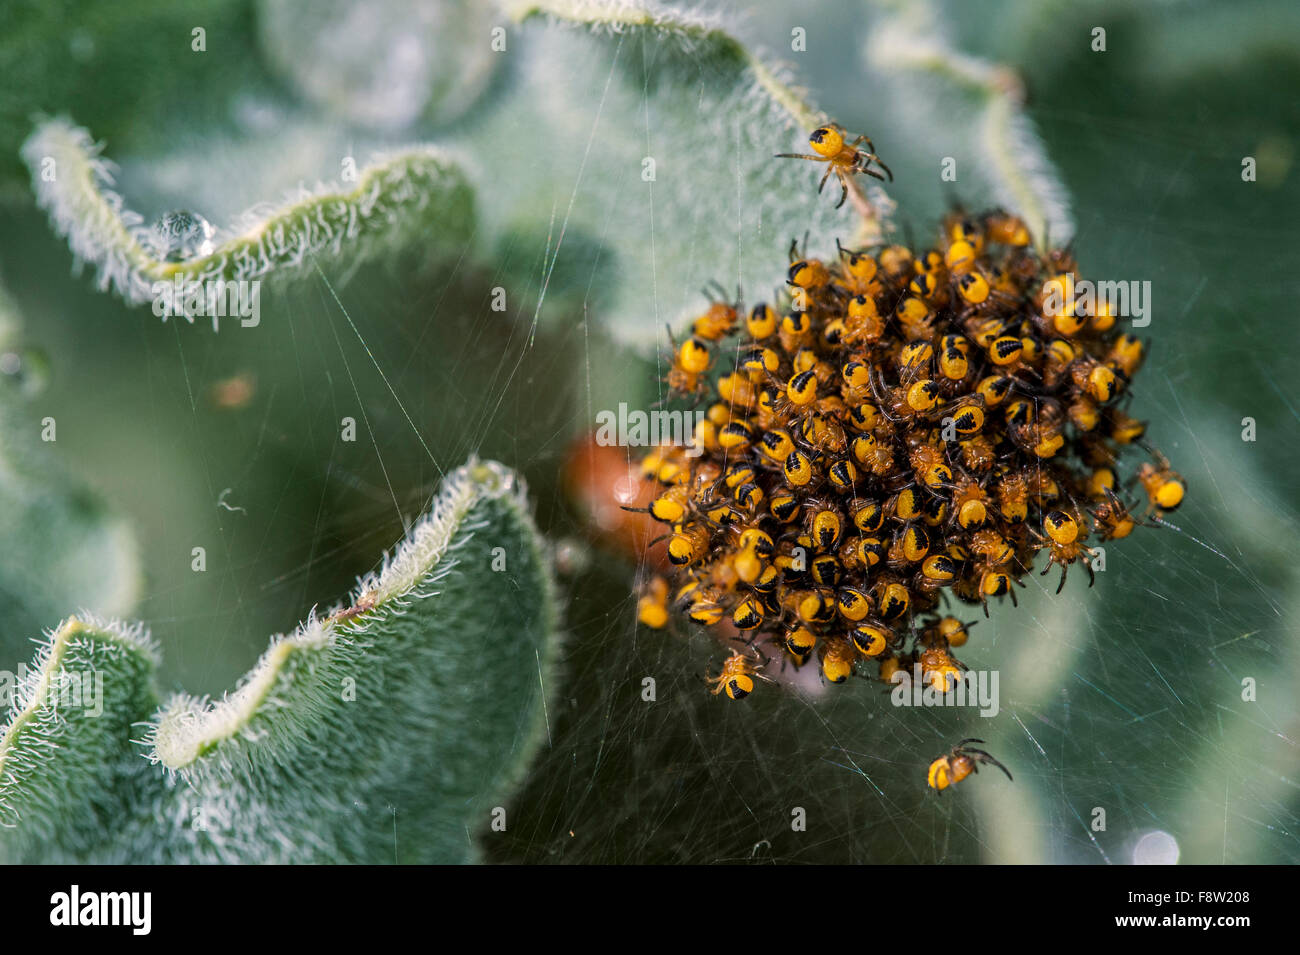 Le jardin européen / araignée araignée Araneus diadematus diadem (cluster), de quelques petits jours Photo Stock